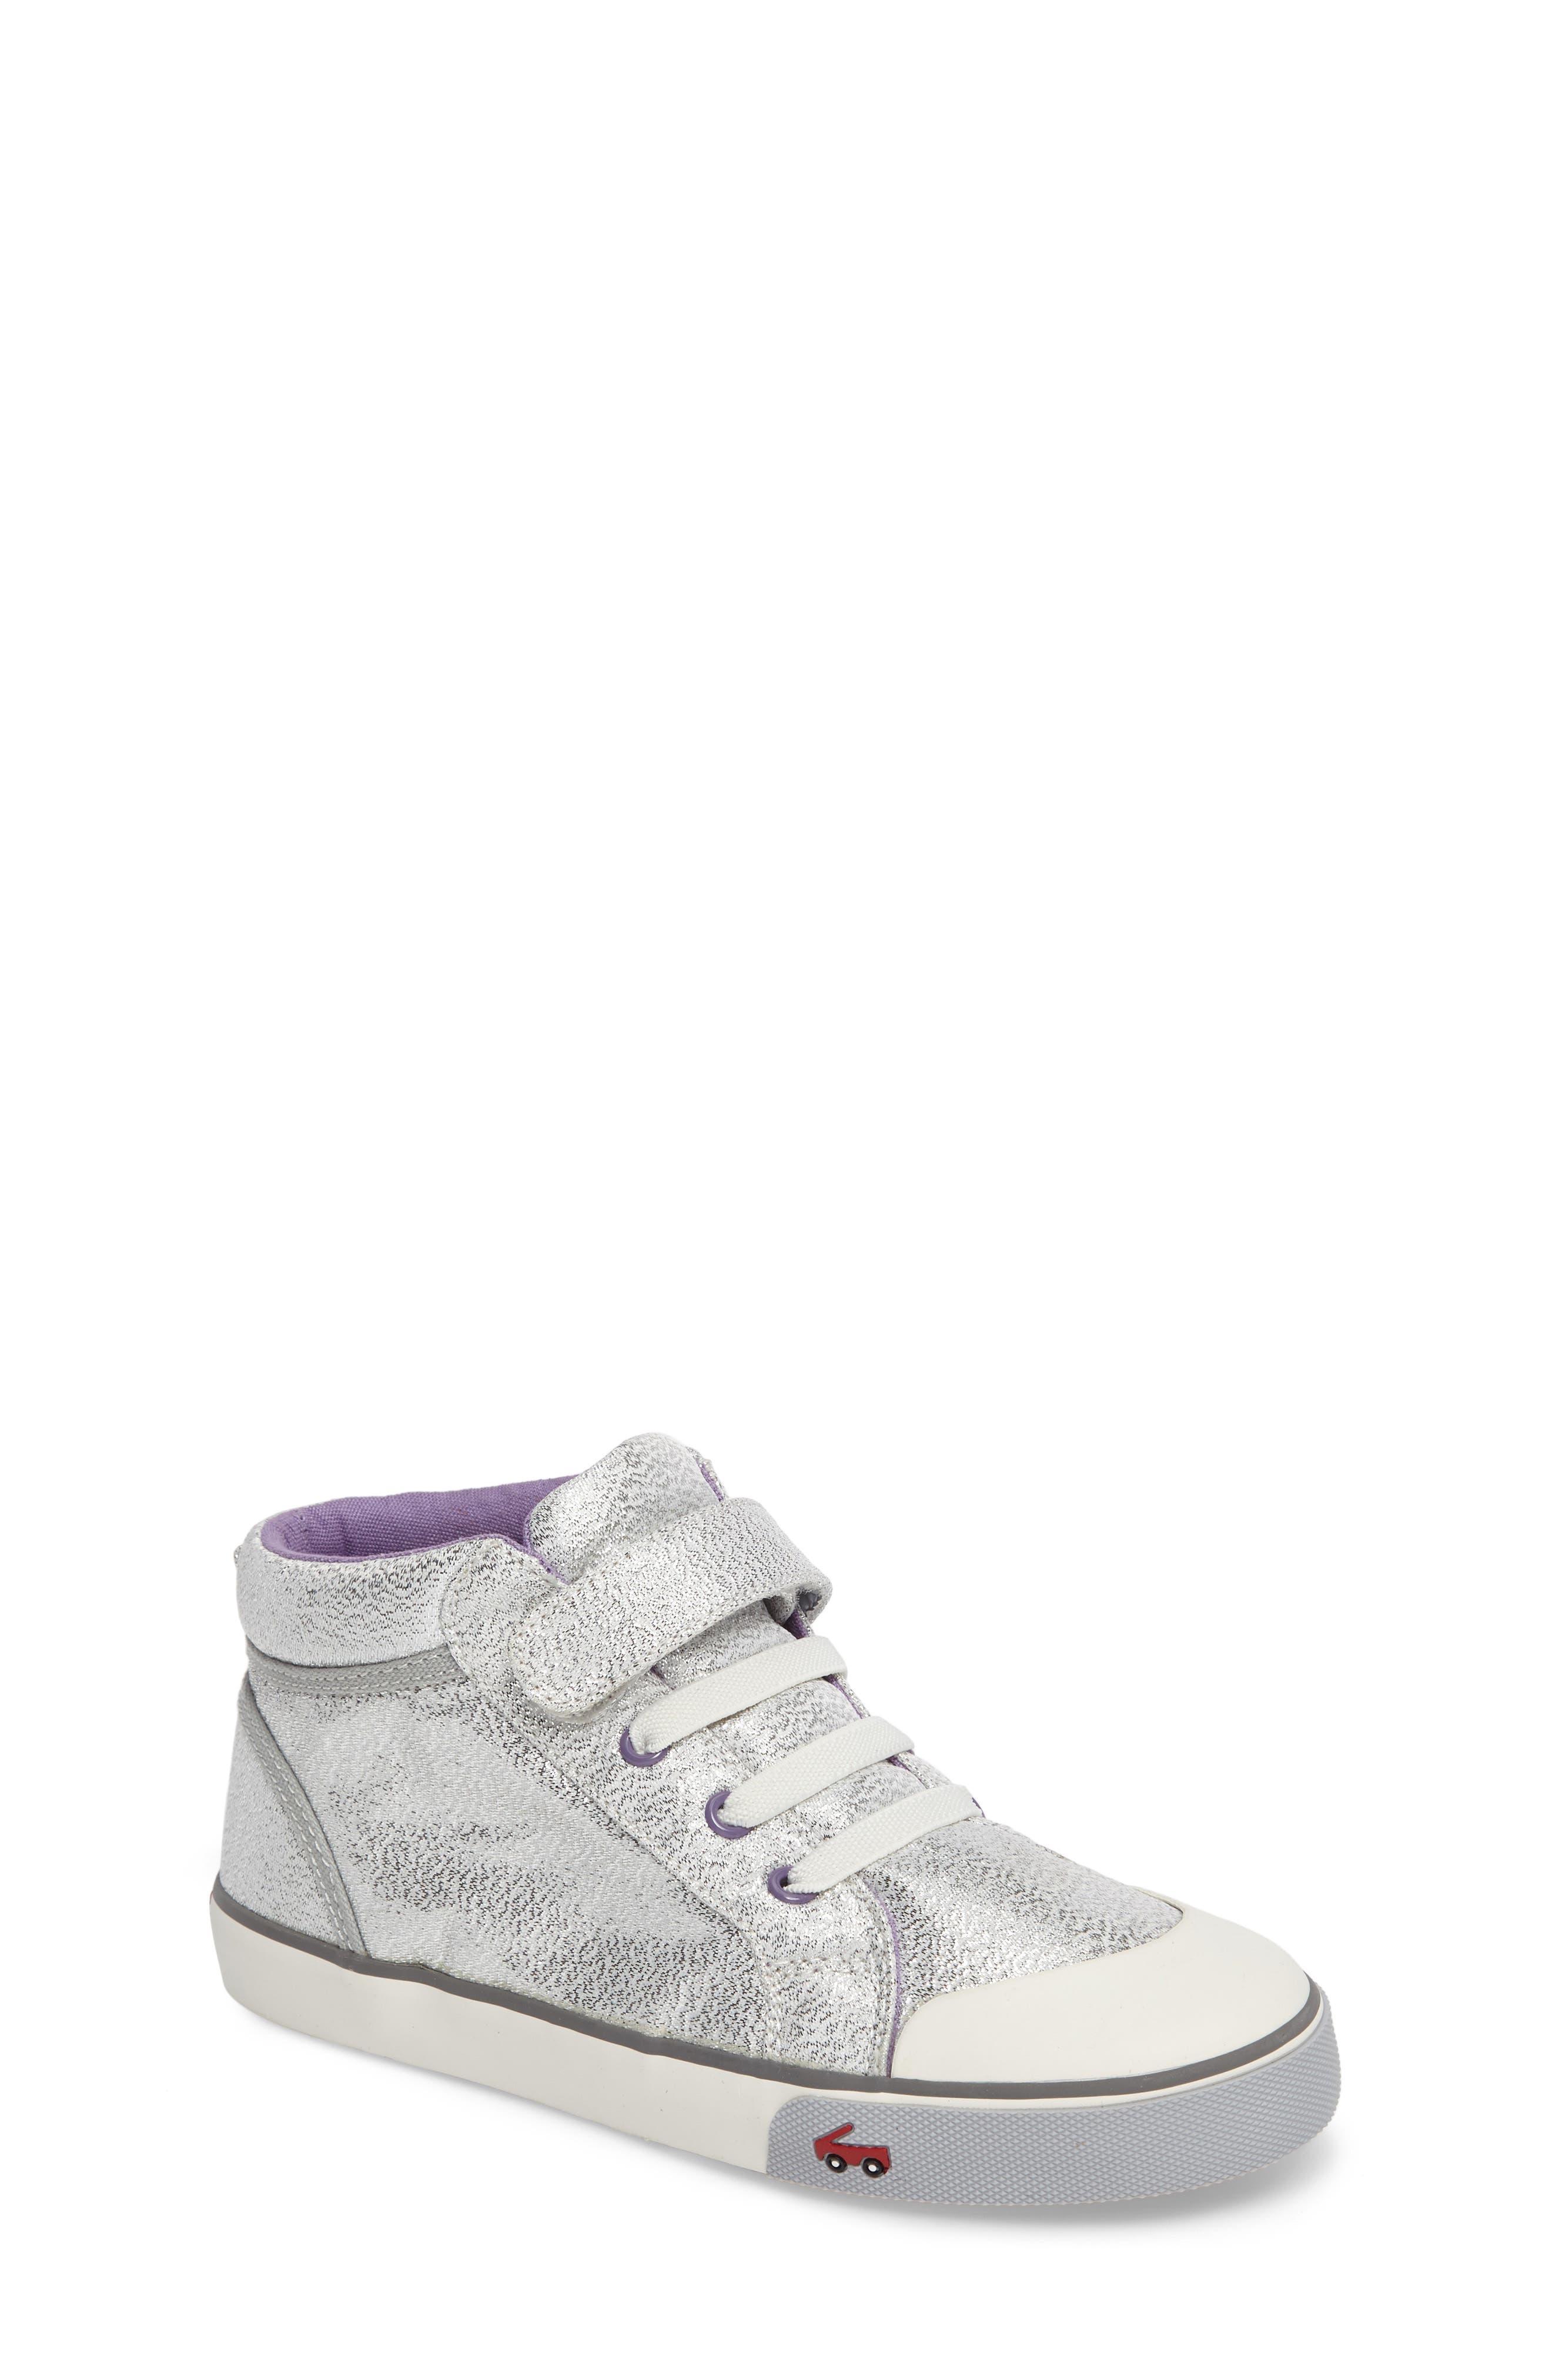 Peyton Metallic Mid Top Sneaker,                             Main thumbnail 1, color,                             Silver